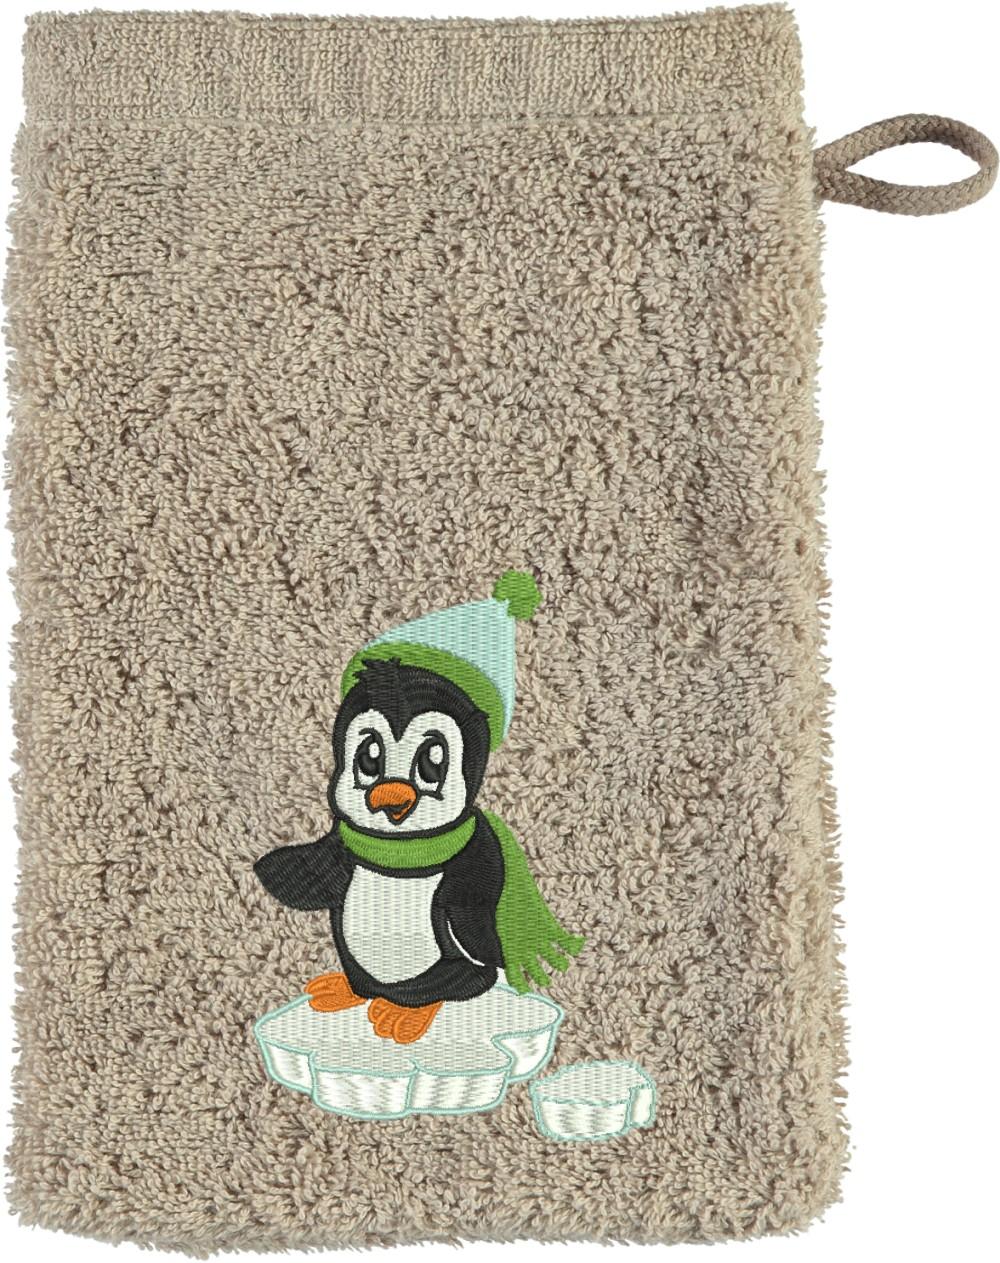 Waschhandschuh Pinguin in verschiedenen Farben